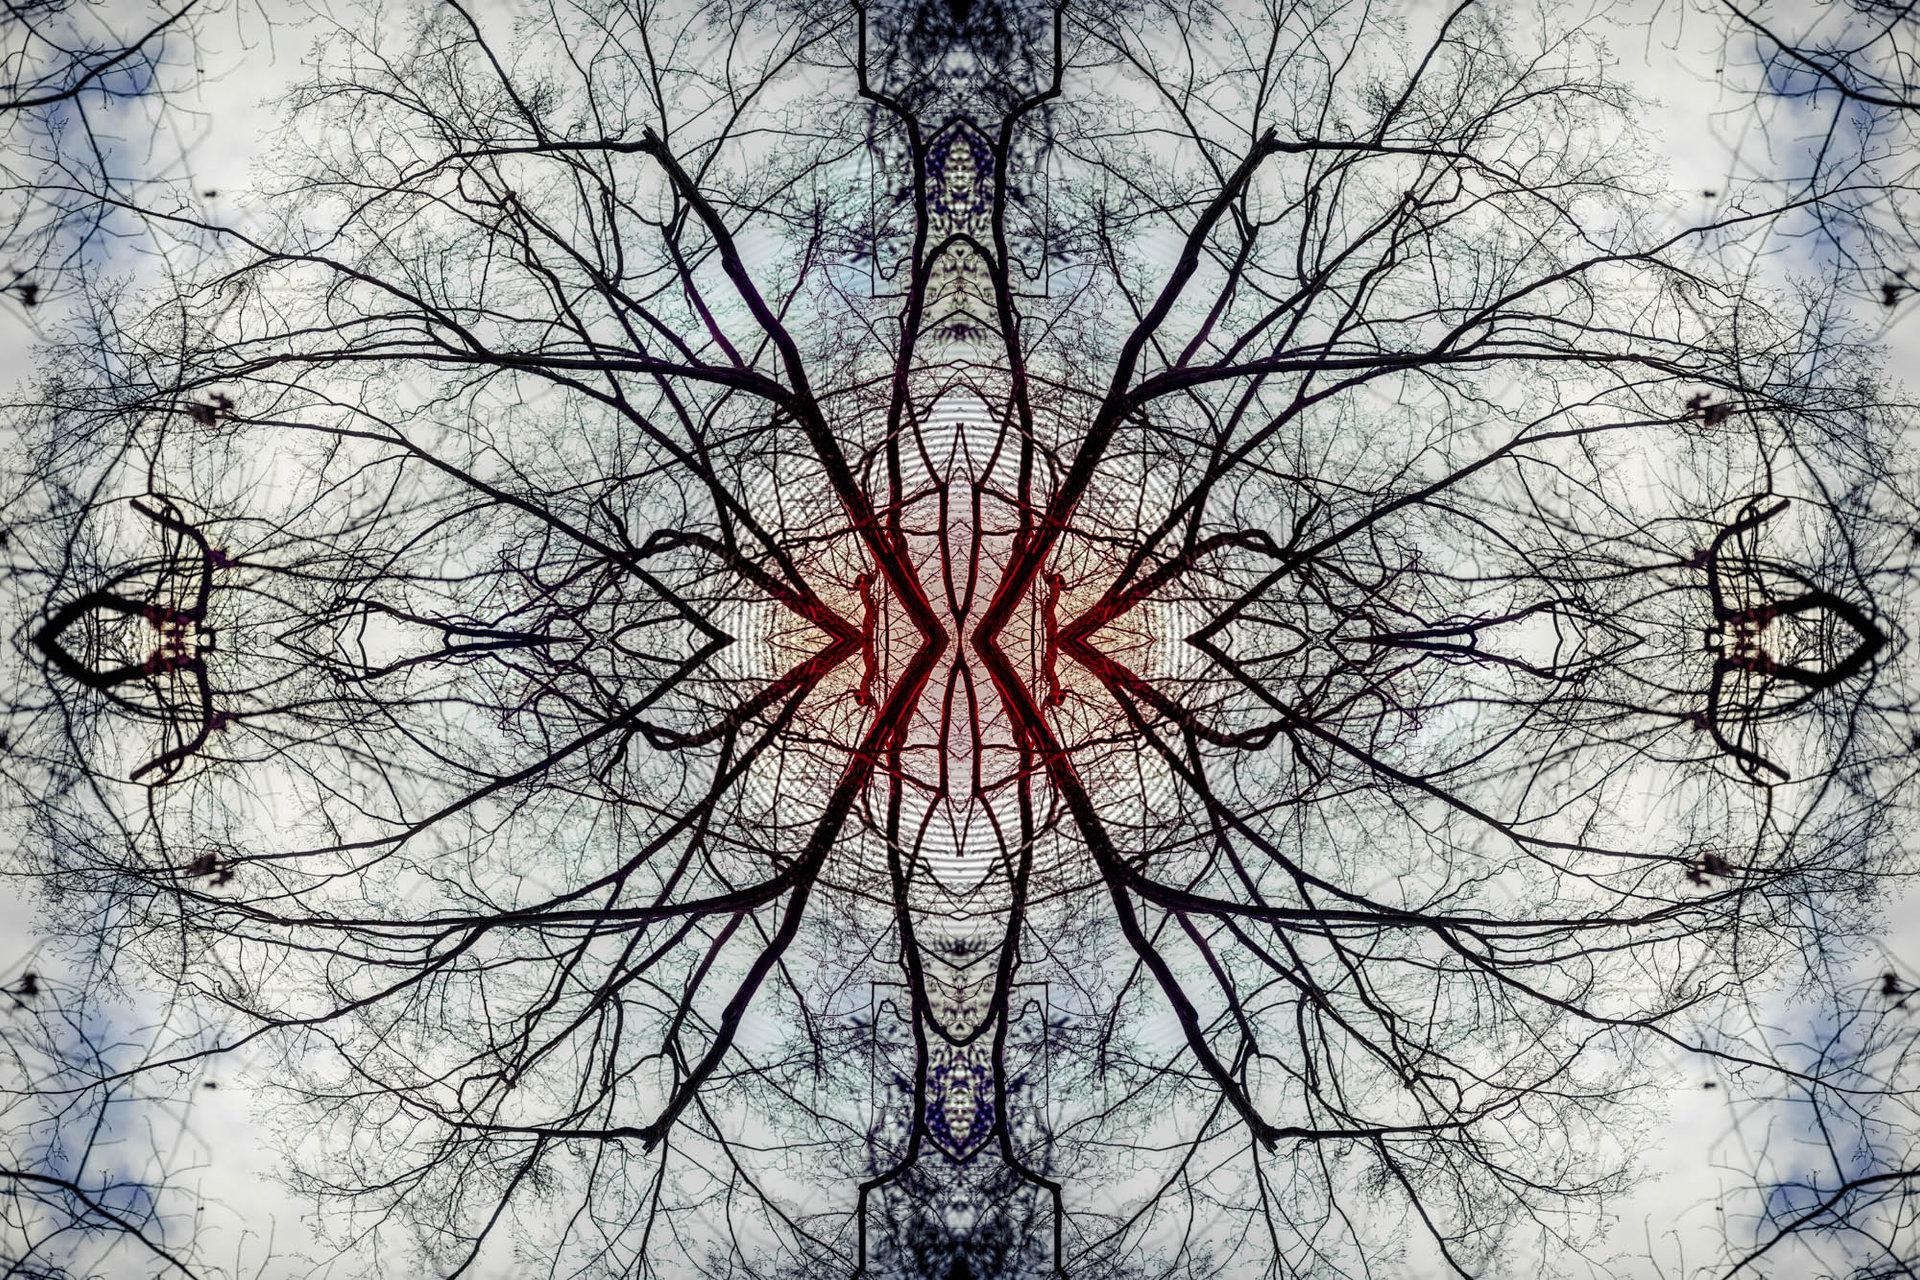 MIR - Winterheart Grove - CLR2.jpg